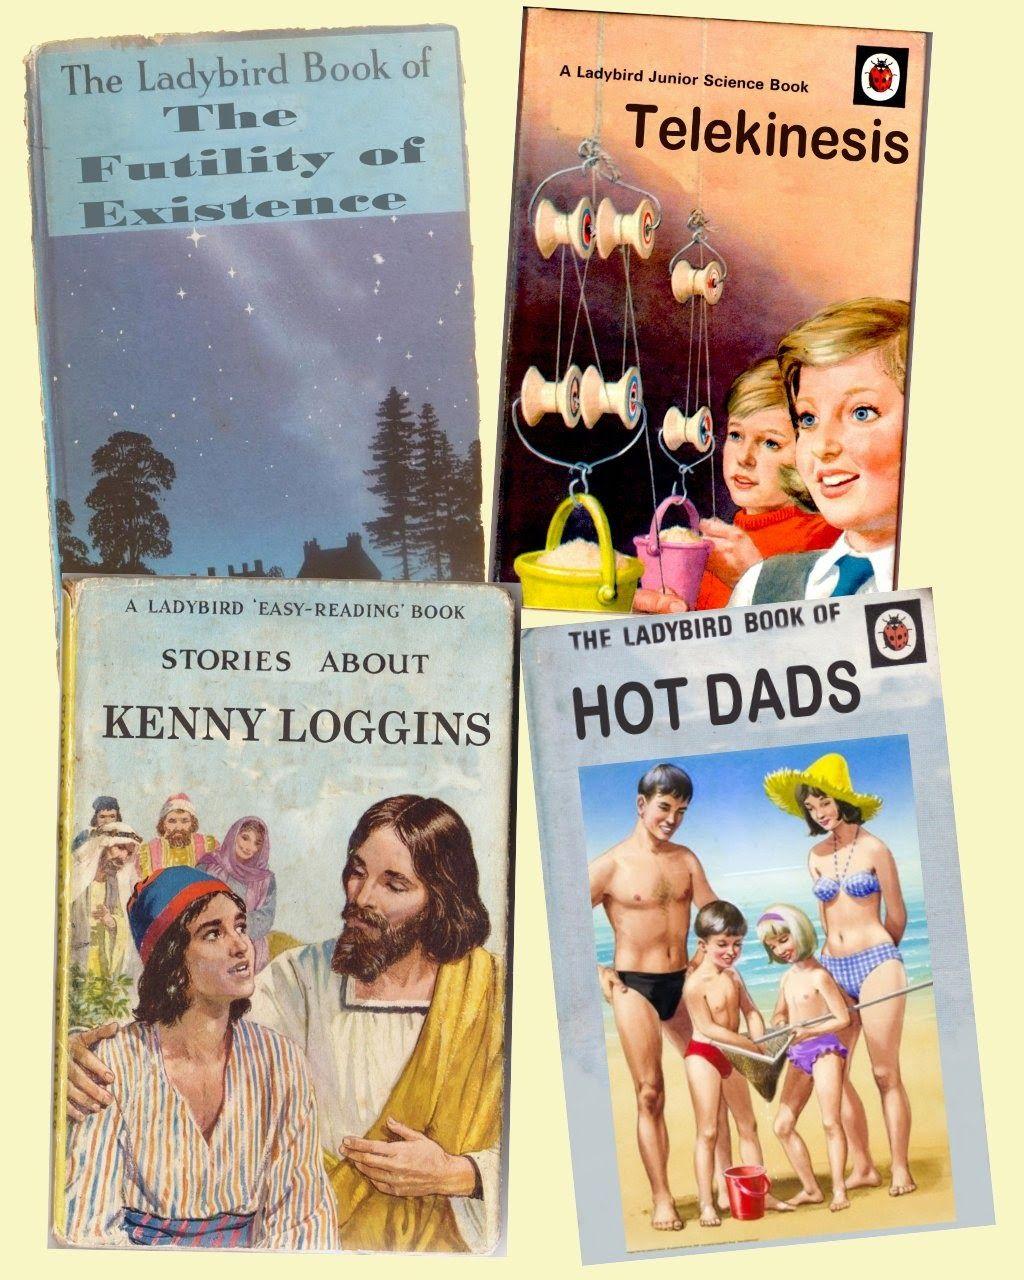 spoof ladybird books - Google Search | Spoof Ladybird Book ...